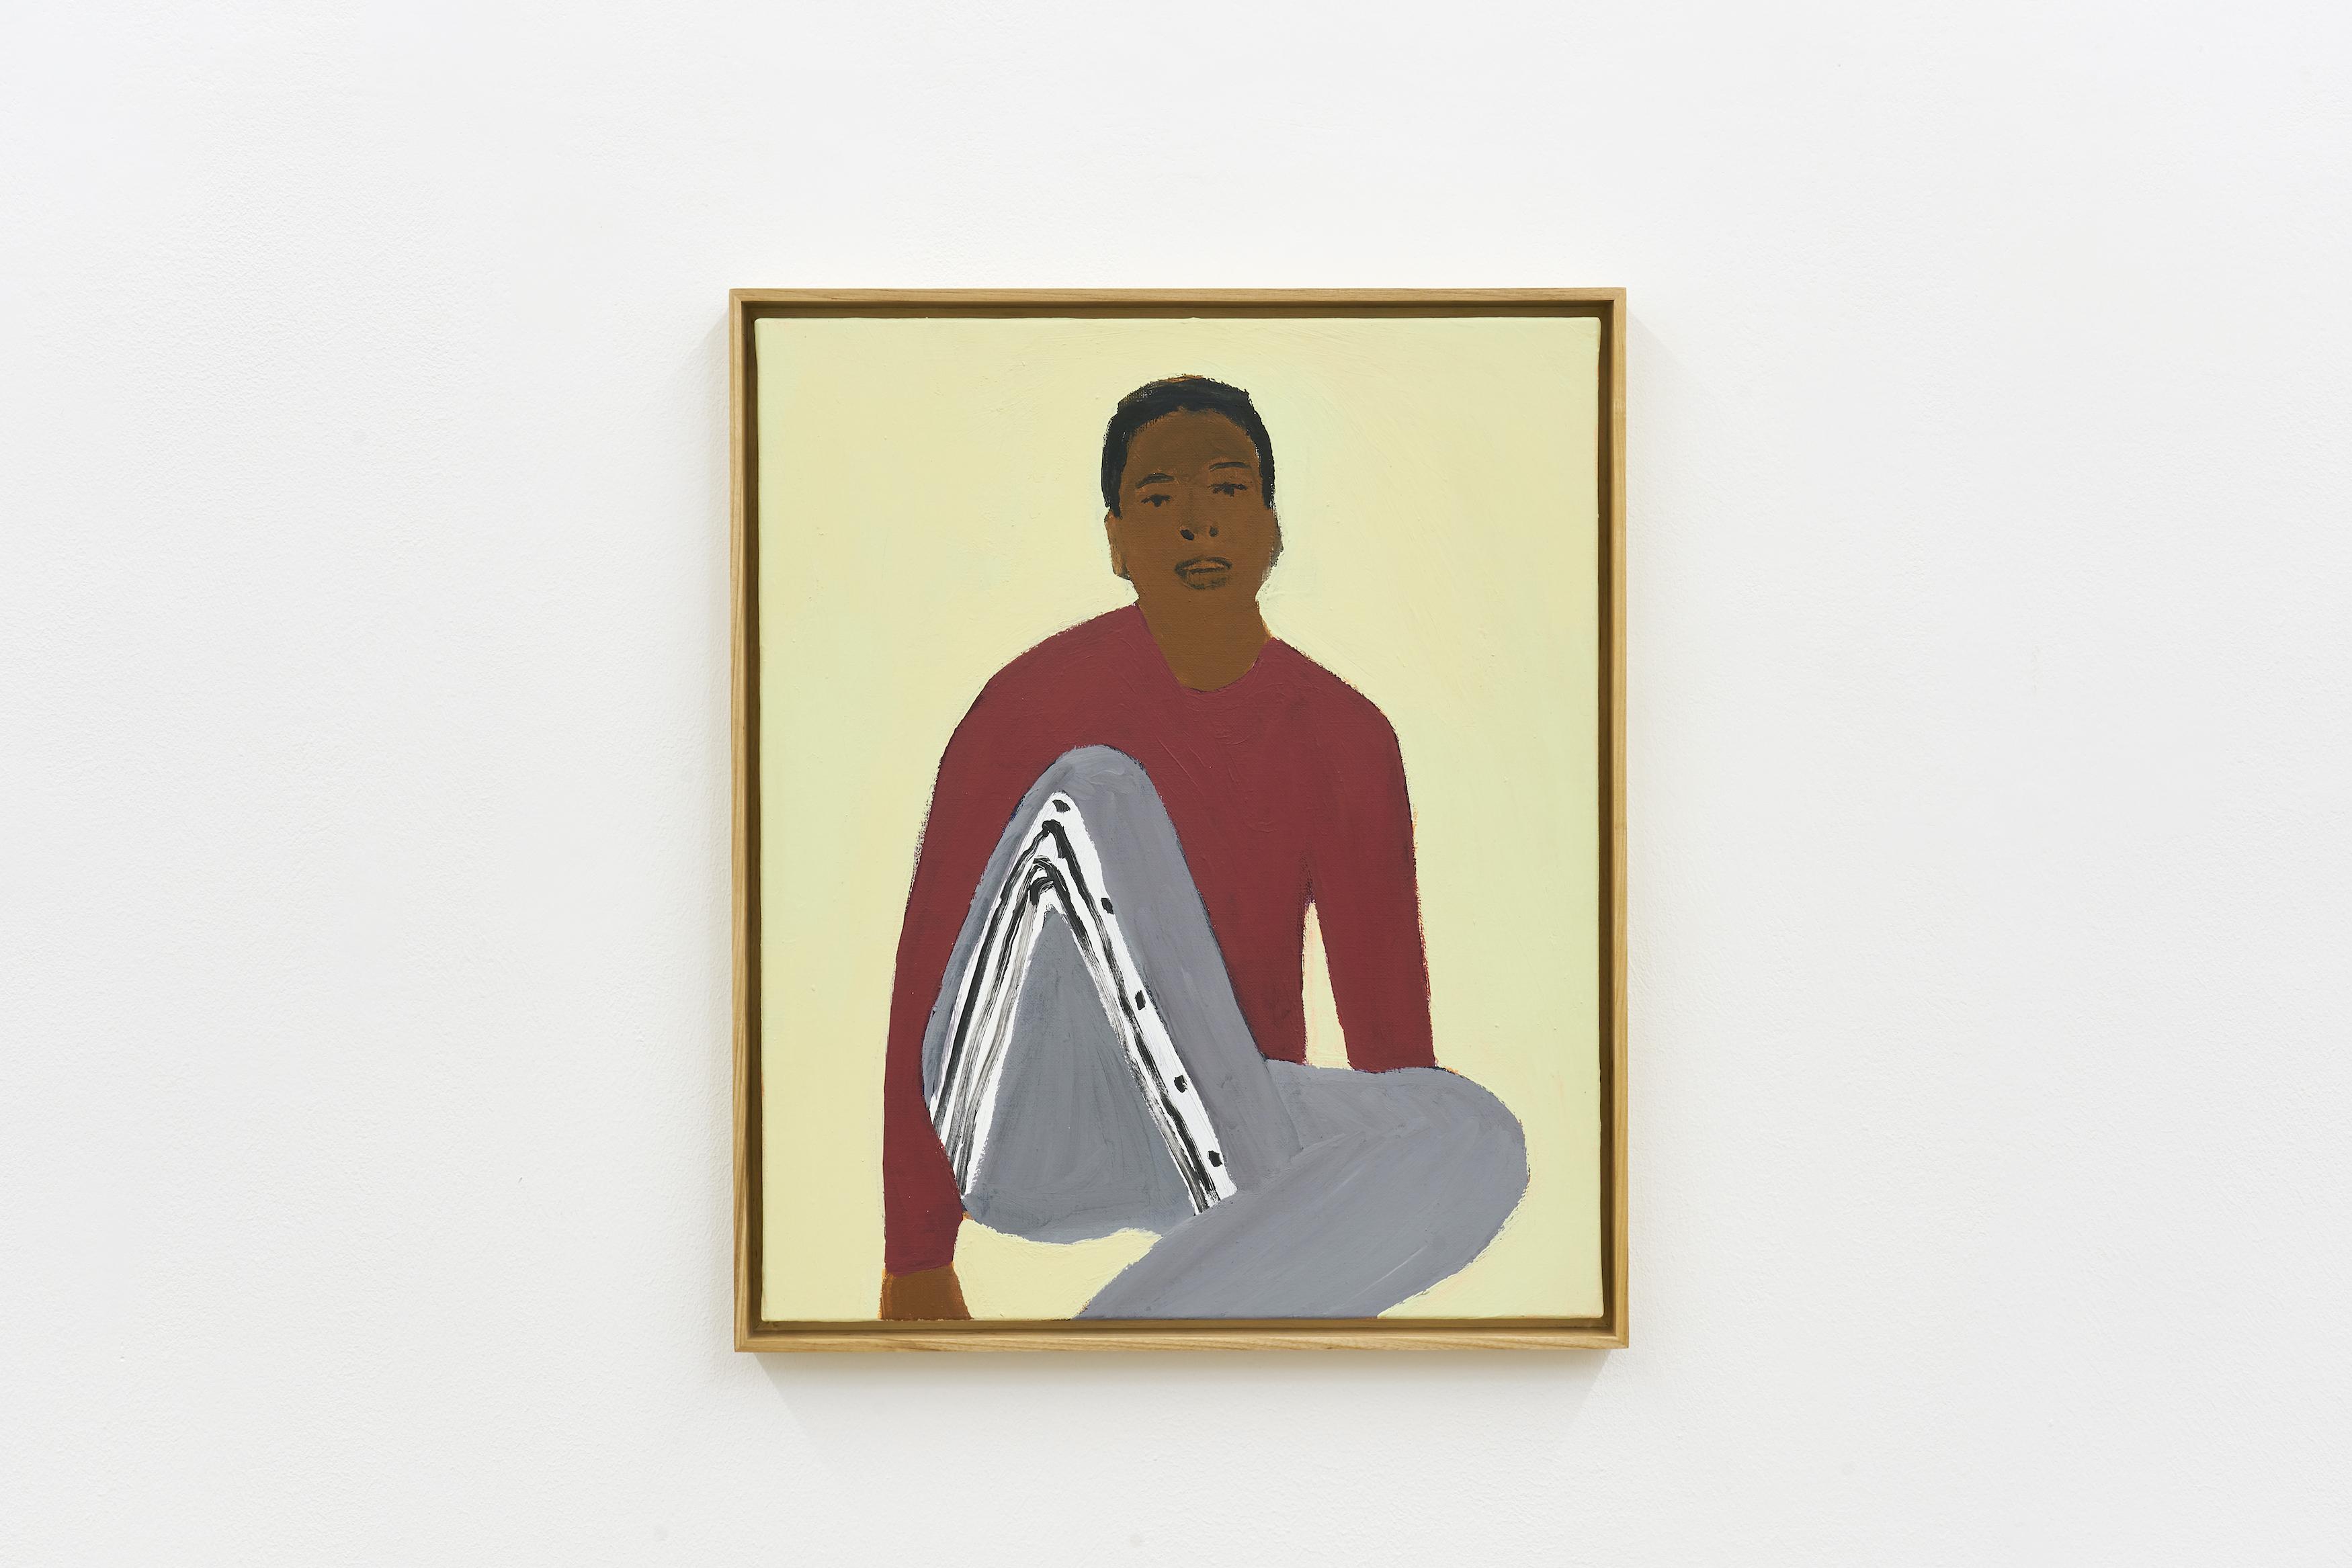 Gregory Olympio, Homme assis, fond vert, 2021, Acrylic on canvas, 61 x 50 cm.